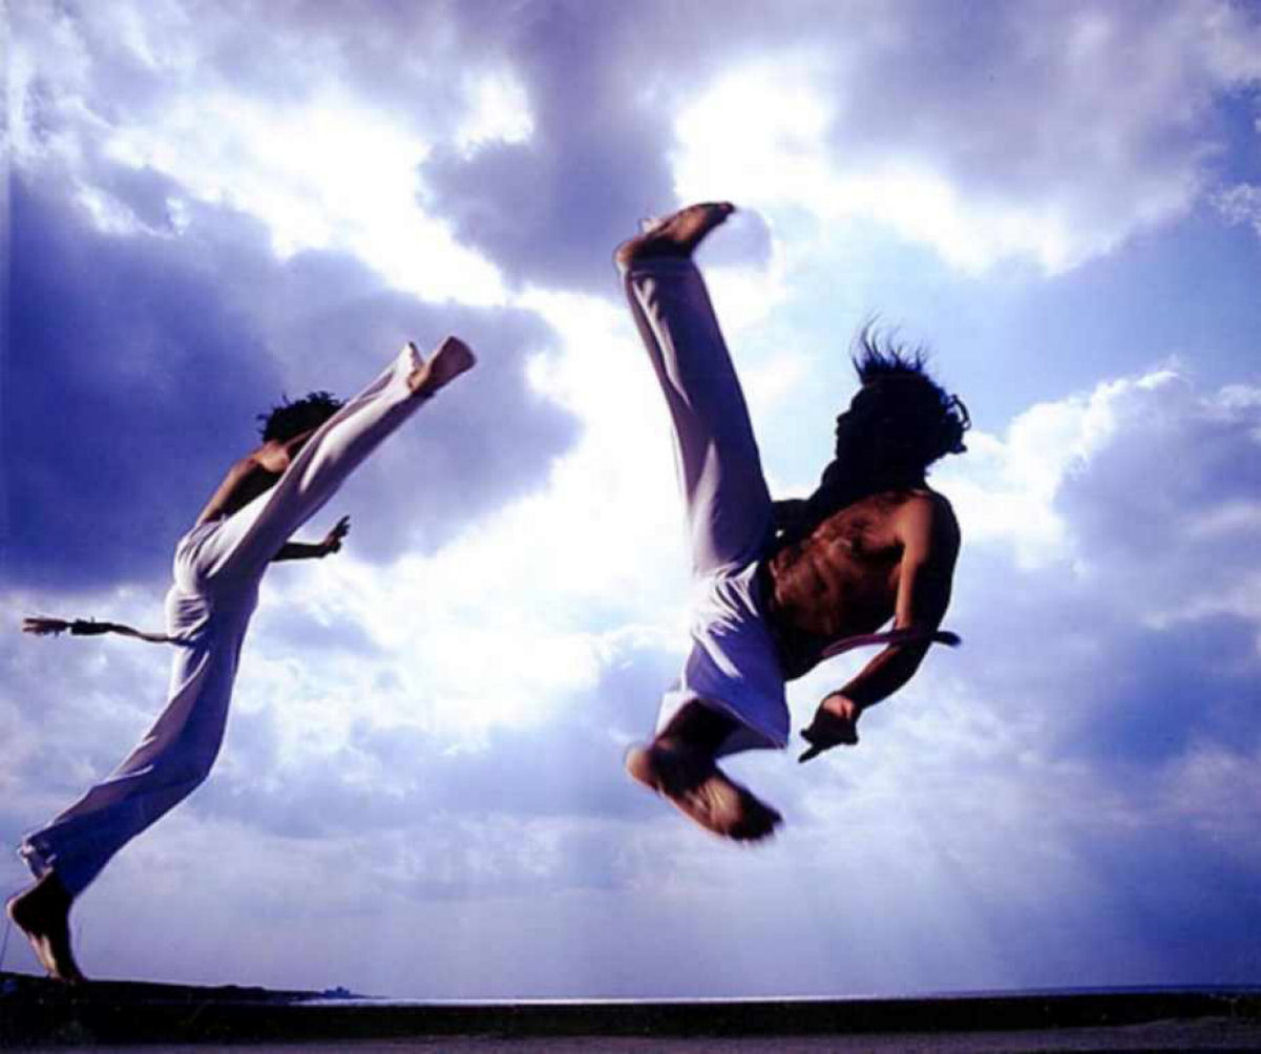 http://3.bp.blogspot.com/_H3Dj1mf3Dnc/TFsc2lv70RI/AAAAAAAAAA8/TpJfp8JAqlw/s1600/capoeira.jpg